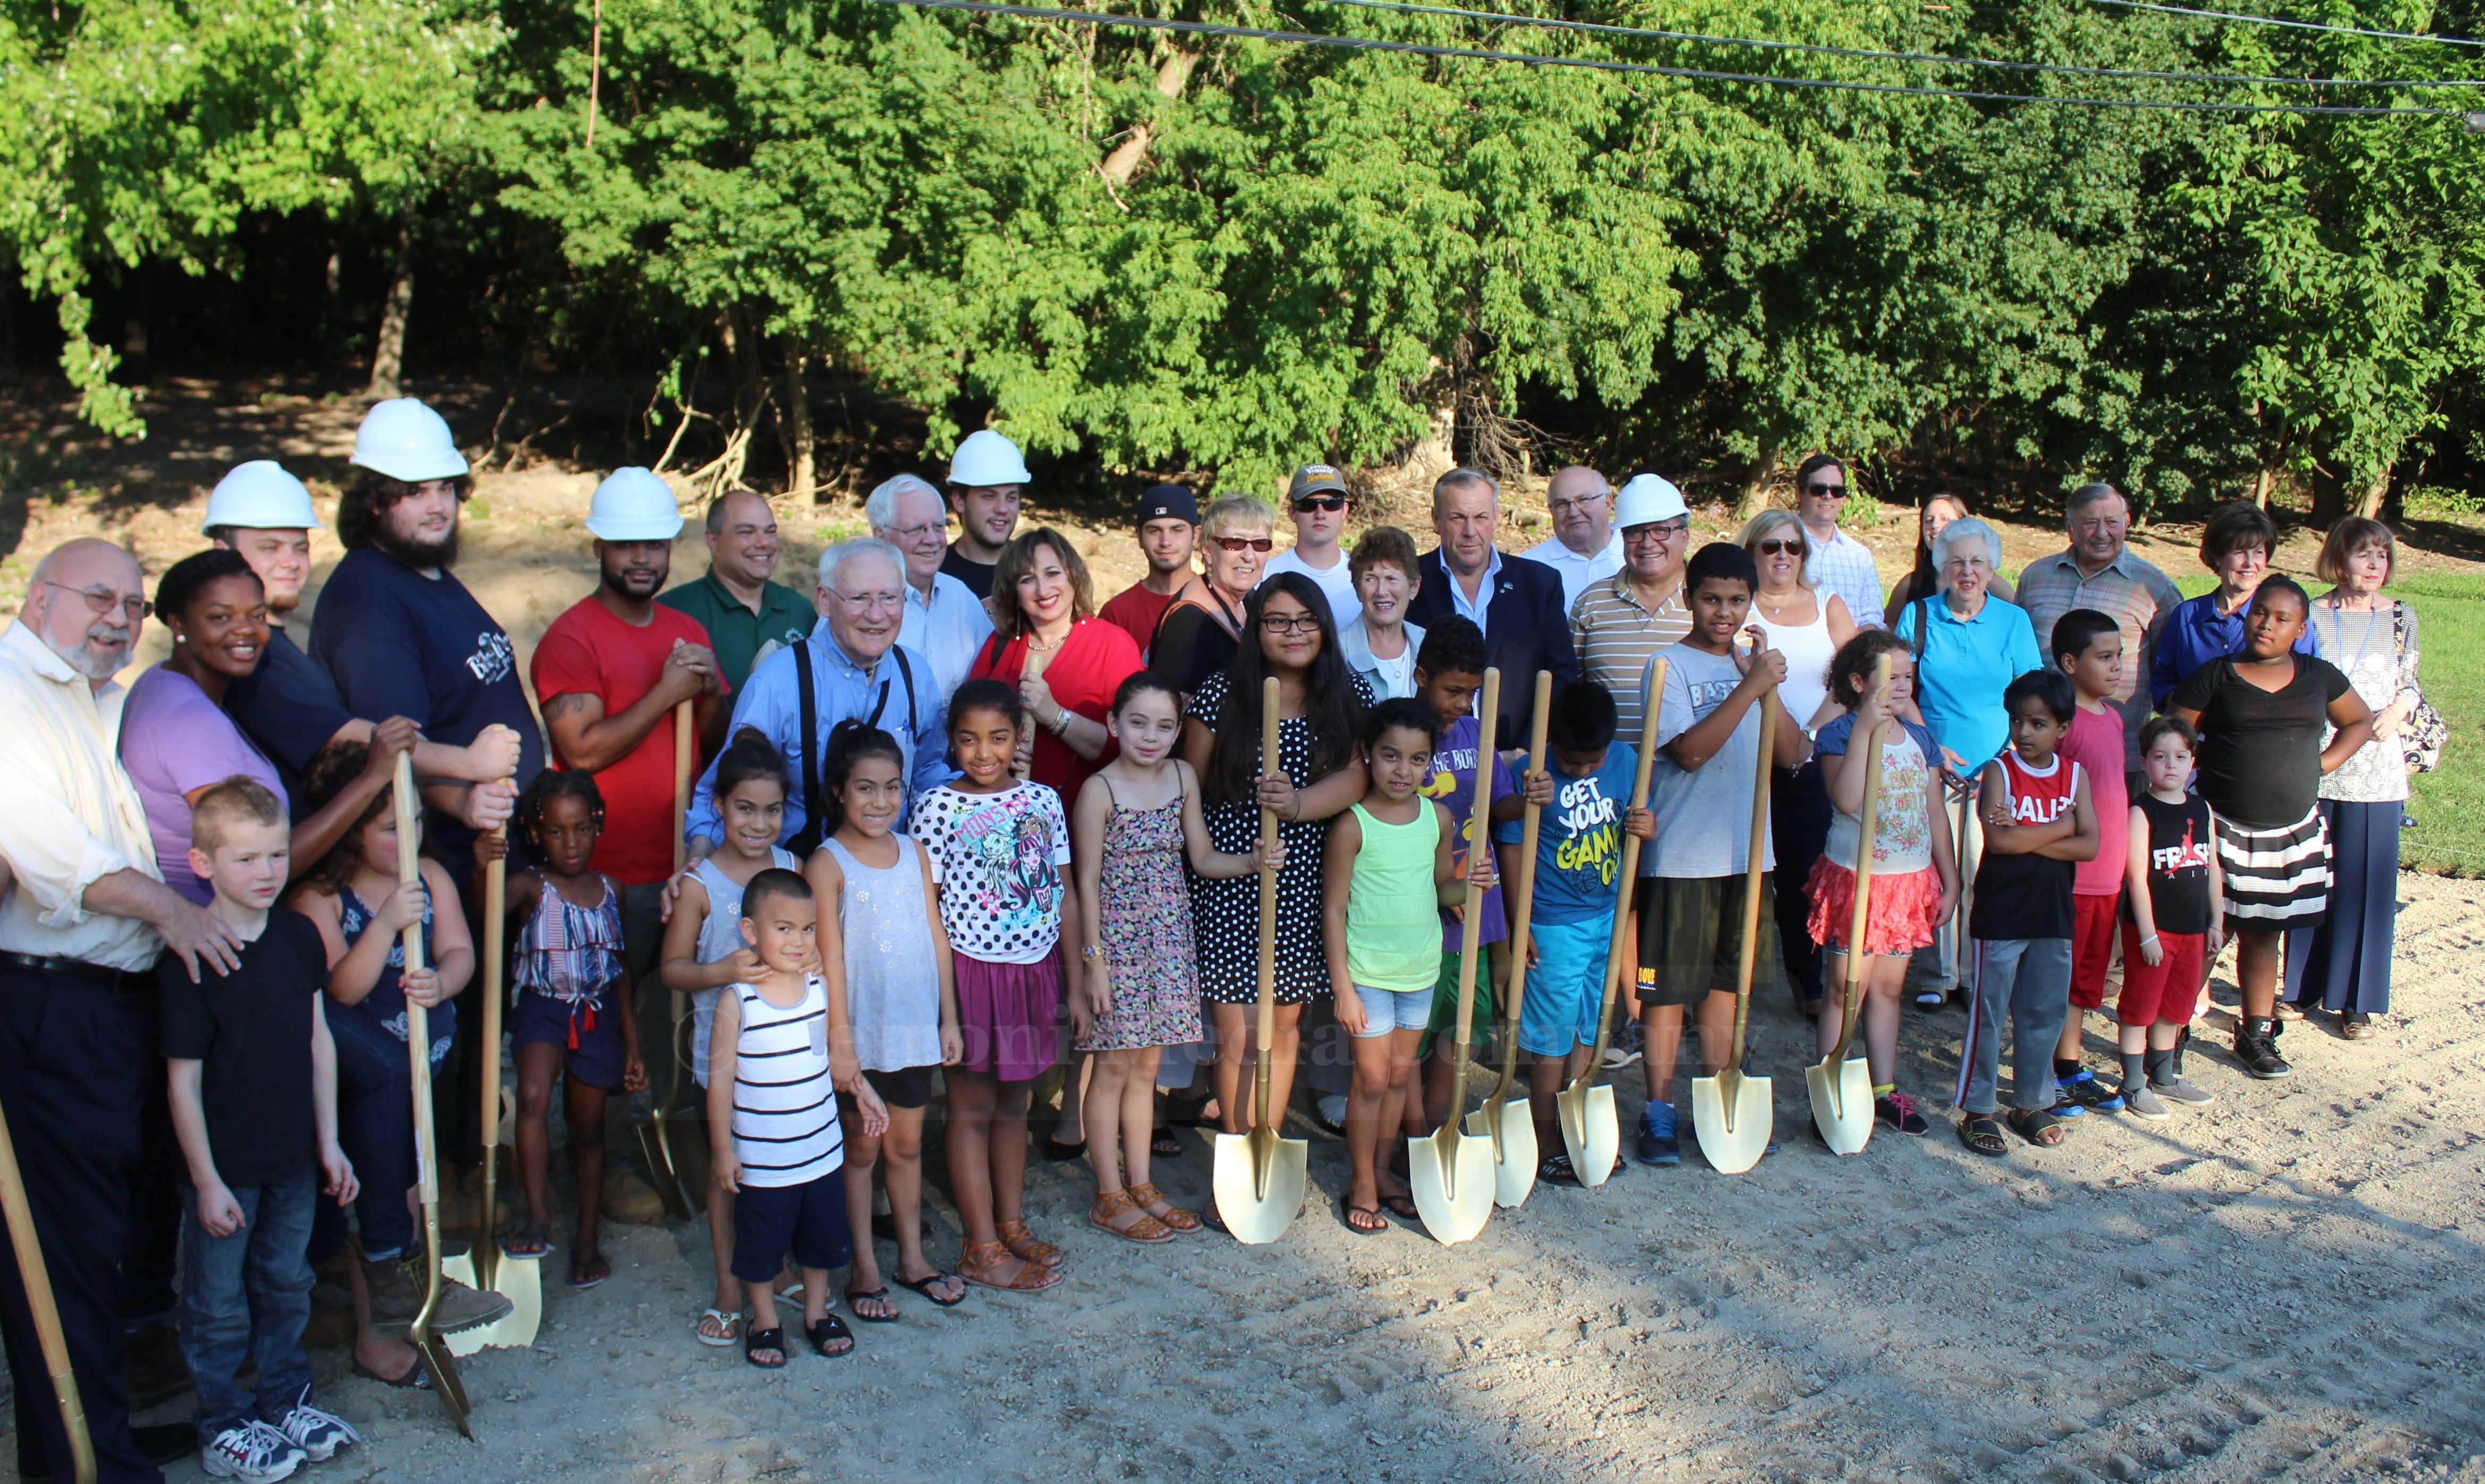 SLIDESHOW: Groundbreaking Ceremony For Hoops & Homework